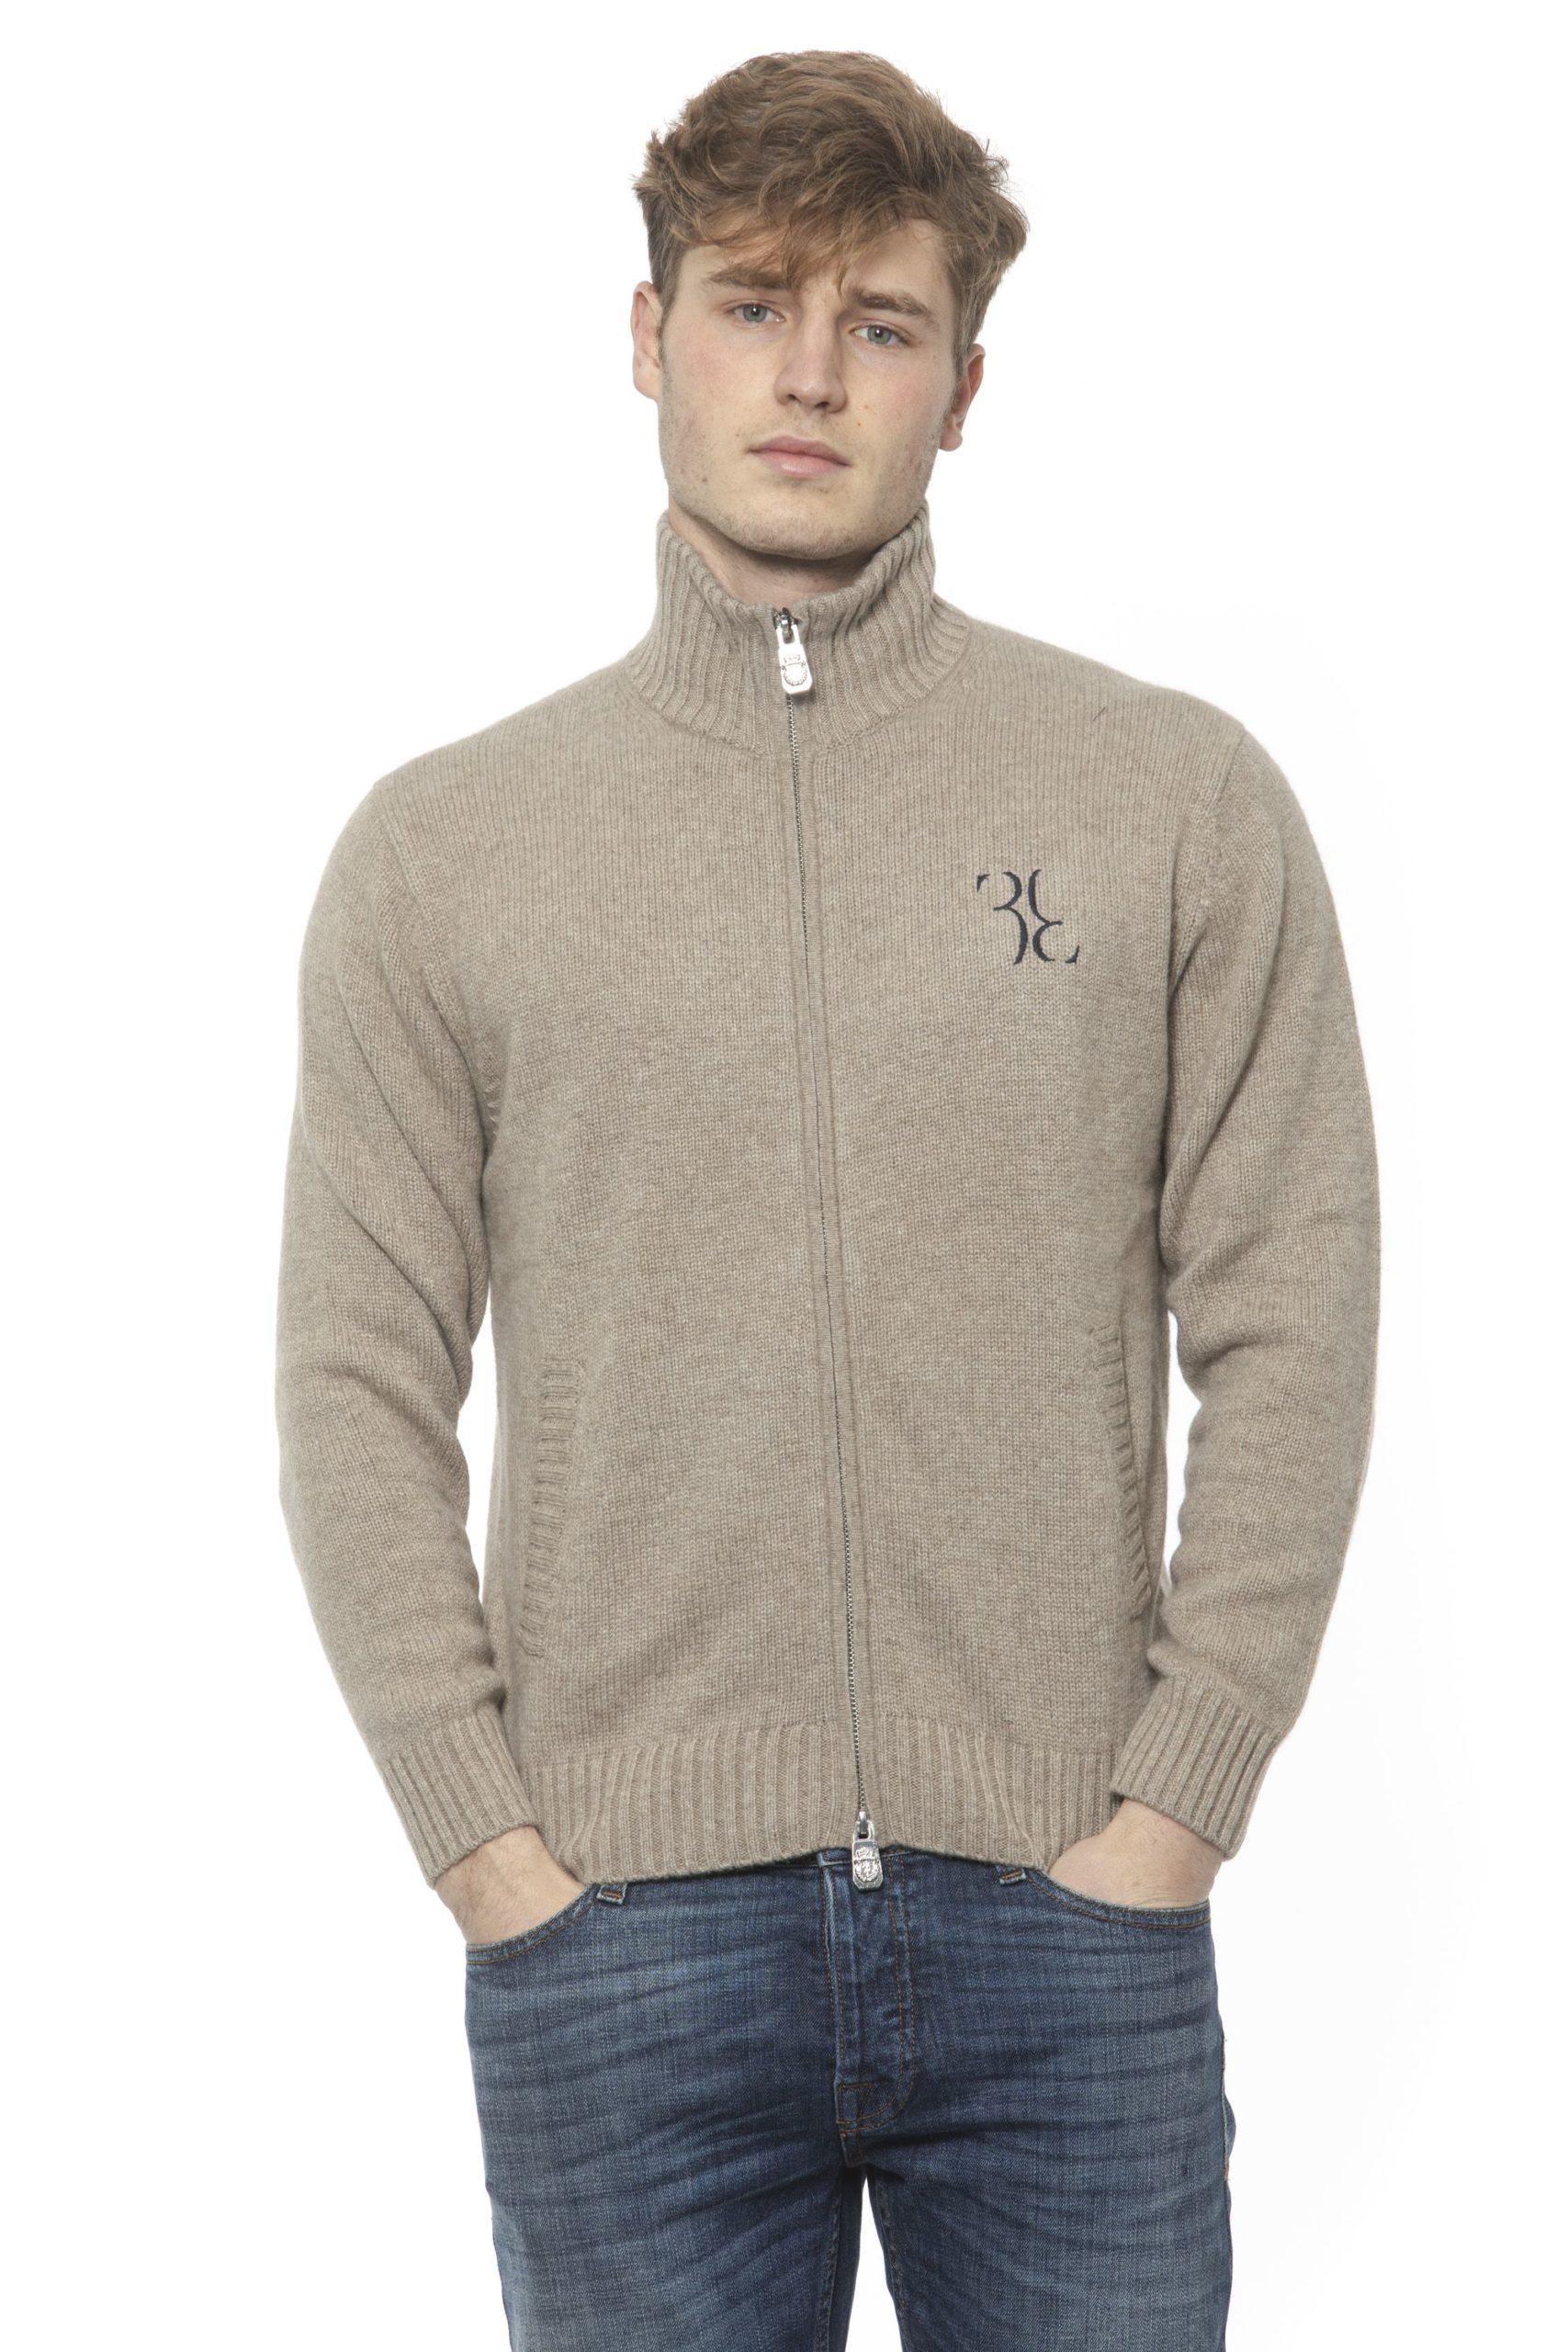 Billionaire Italian Couture Men's Tortora Taupe Sweater Beige BI1313364 - M